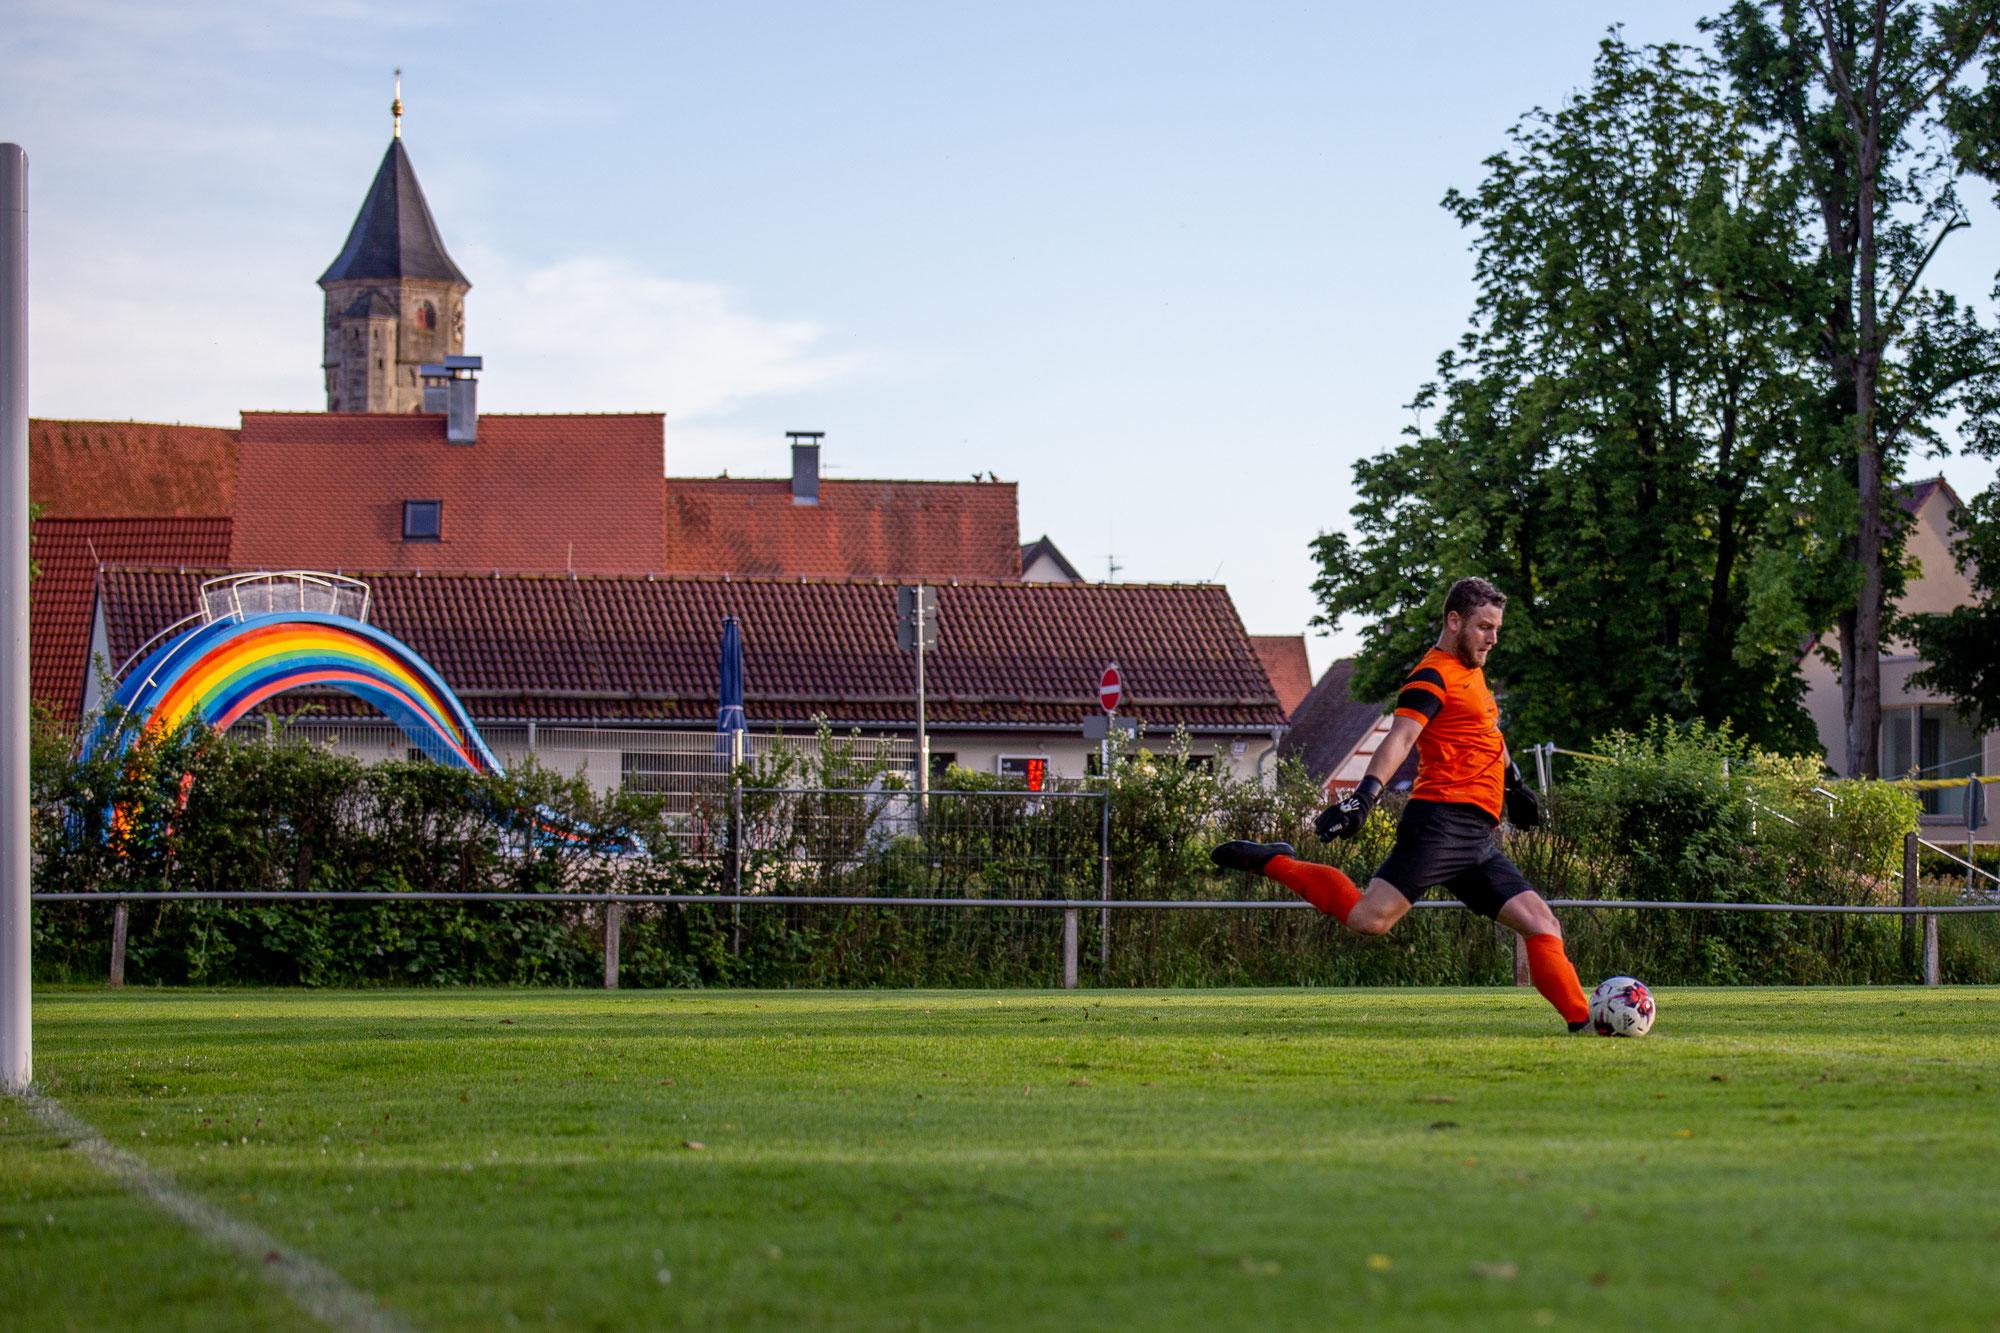 Groundhopping: TSV Neunkirchen vs. SV Tennenlohe